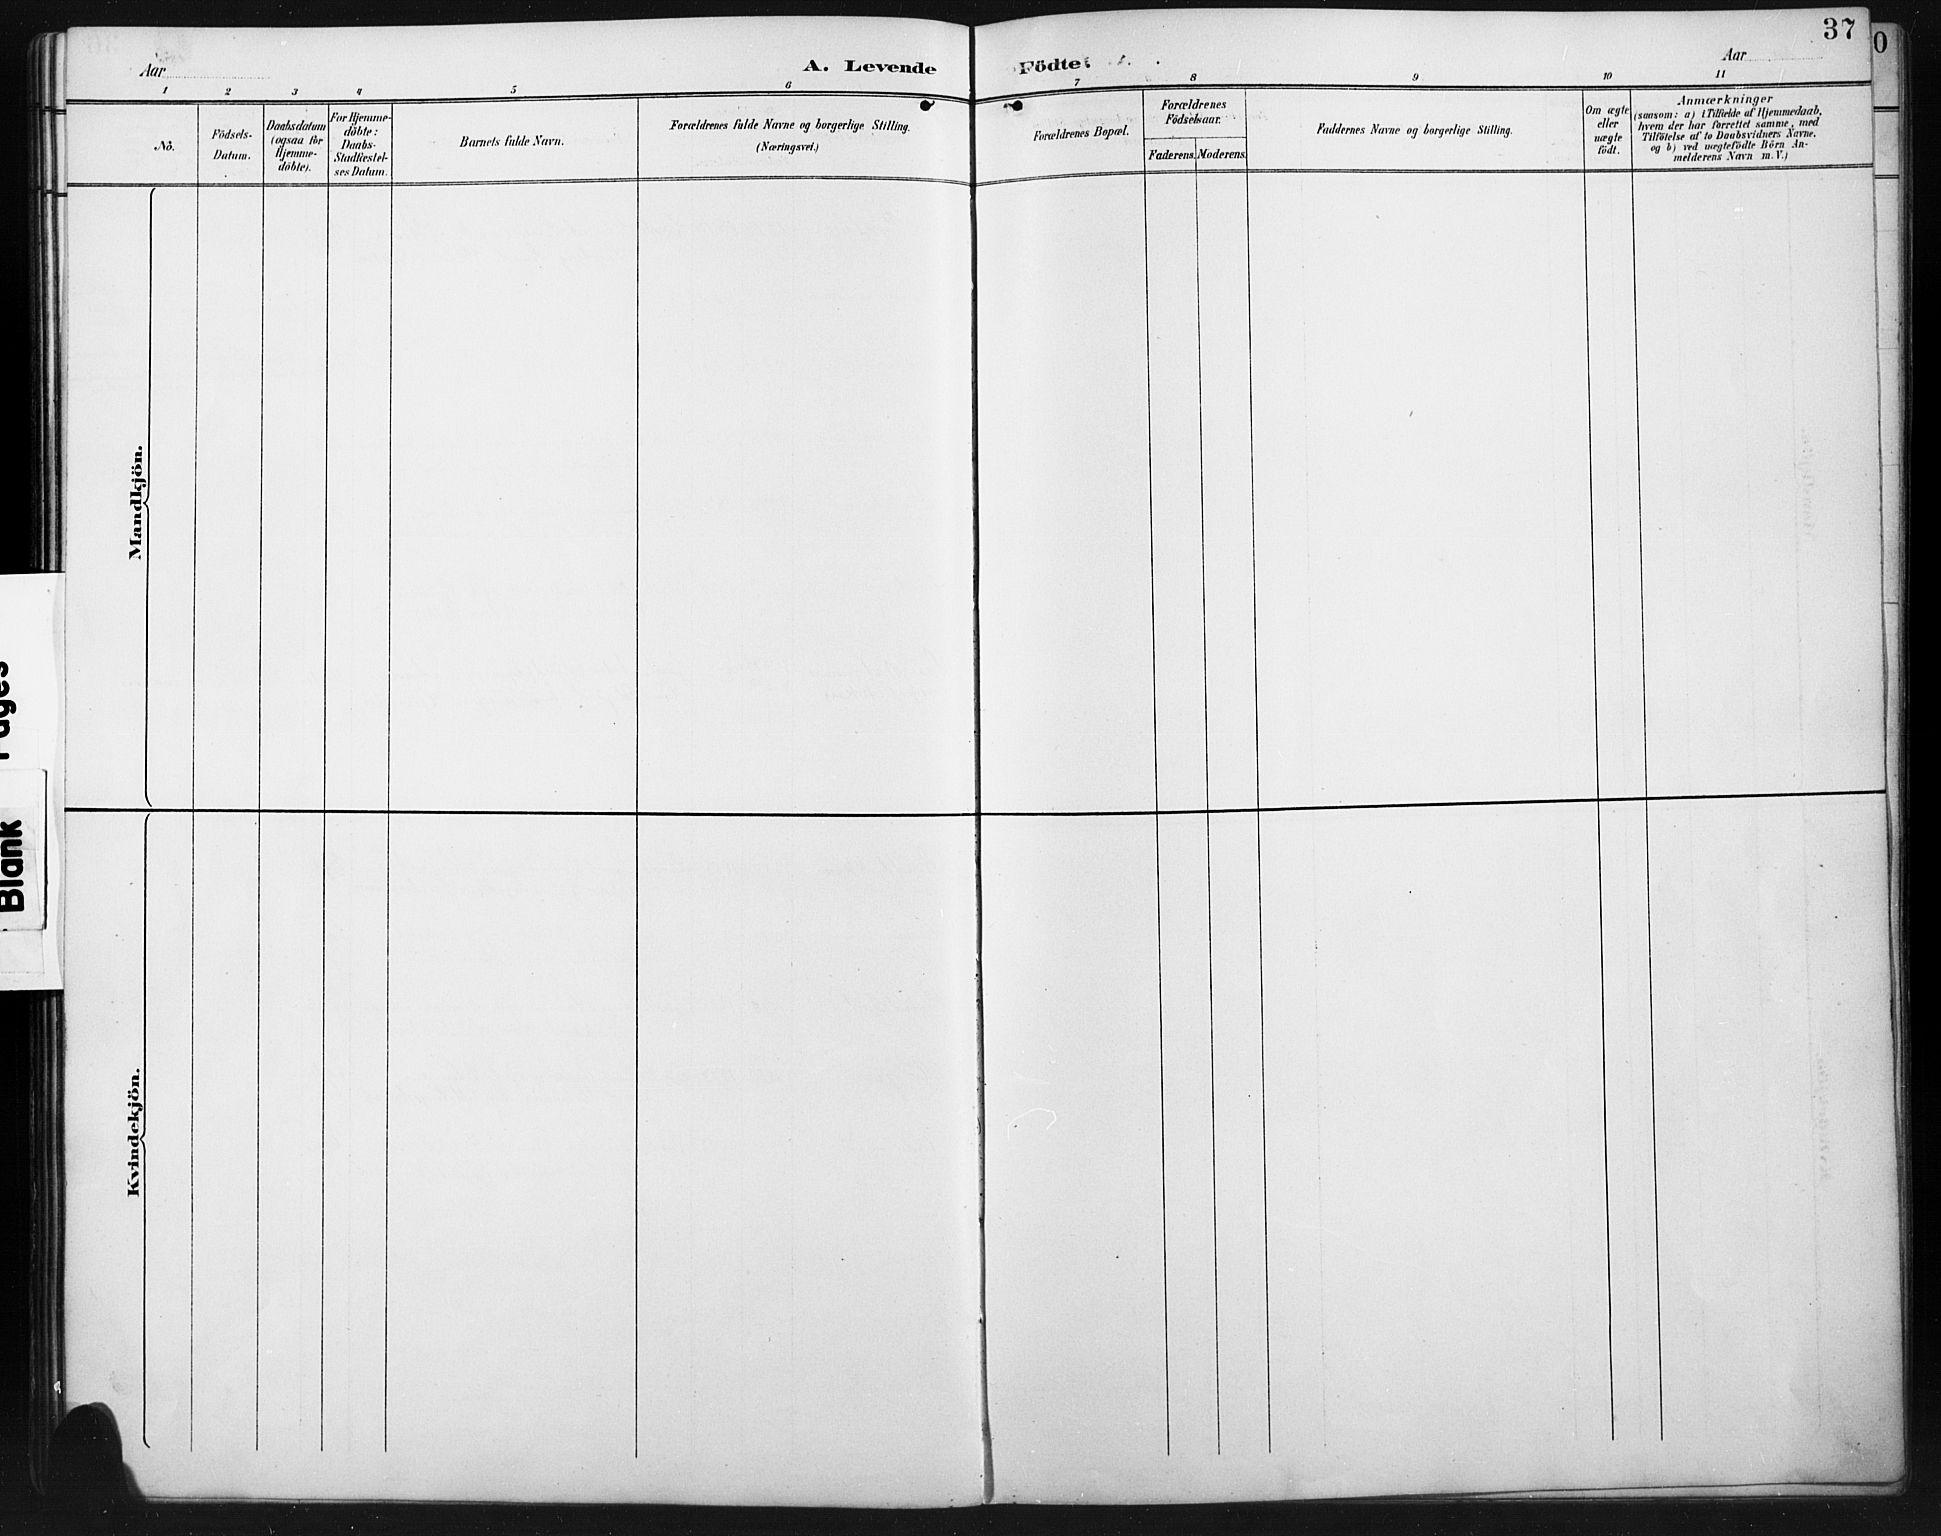 SAH, Ringebu prestekontor, Klokkerbok nr. 8, 1890-1922, s. 37